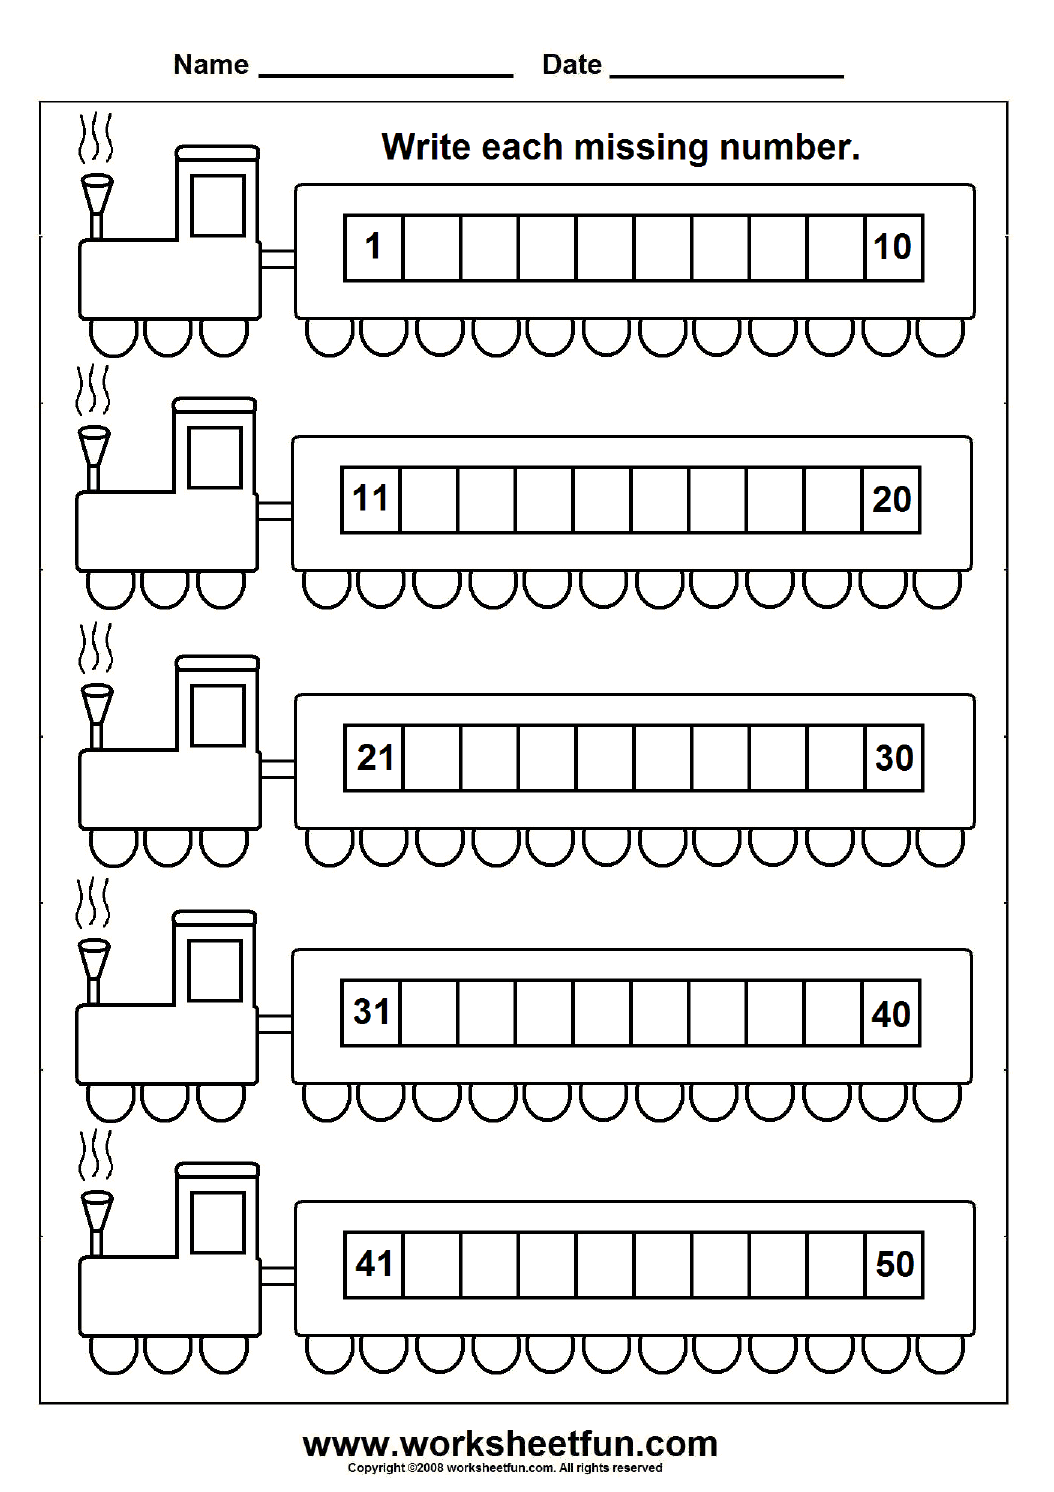 Missing numbers worksheets also printable rh pinterest